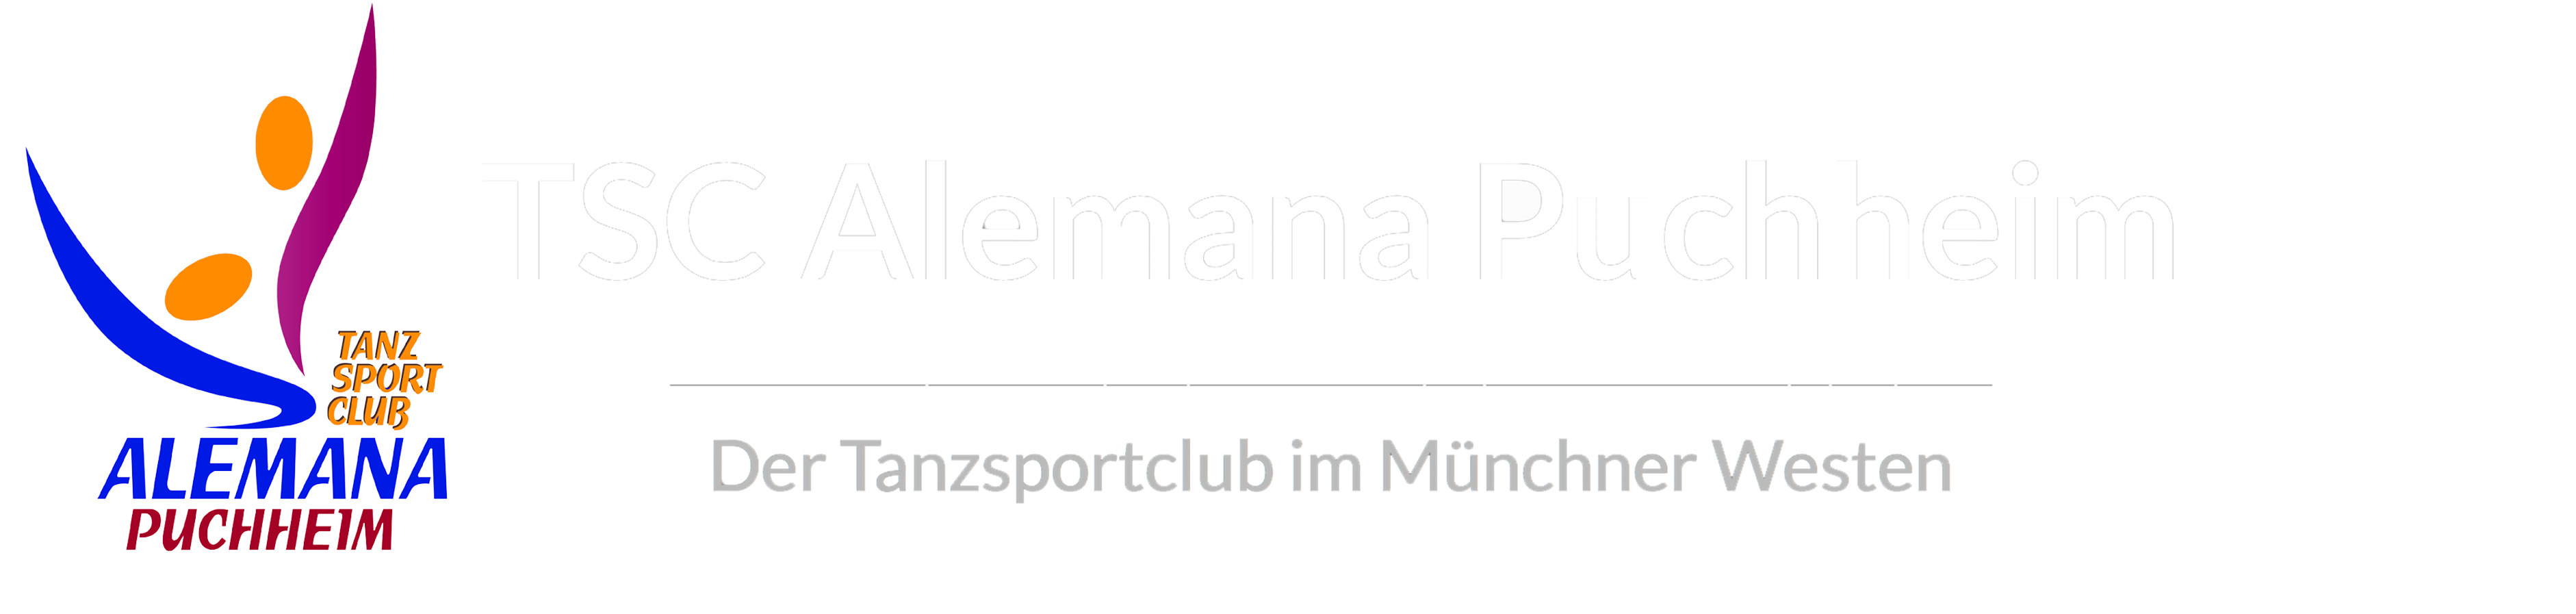 TSC Alemana Puchheim